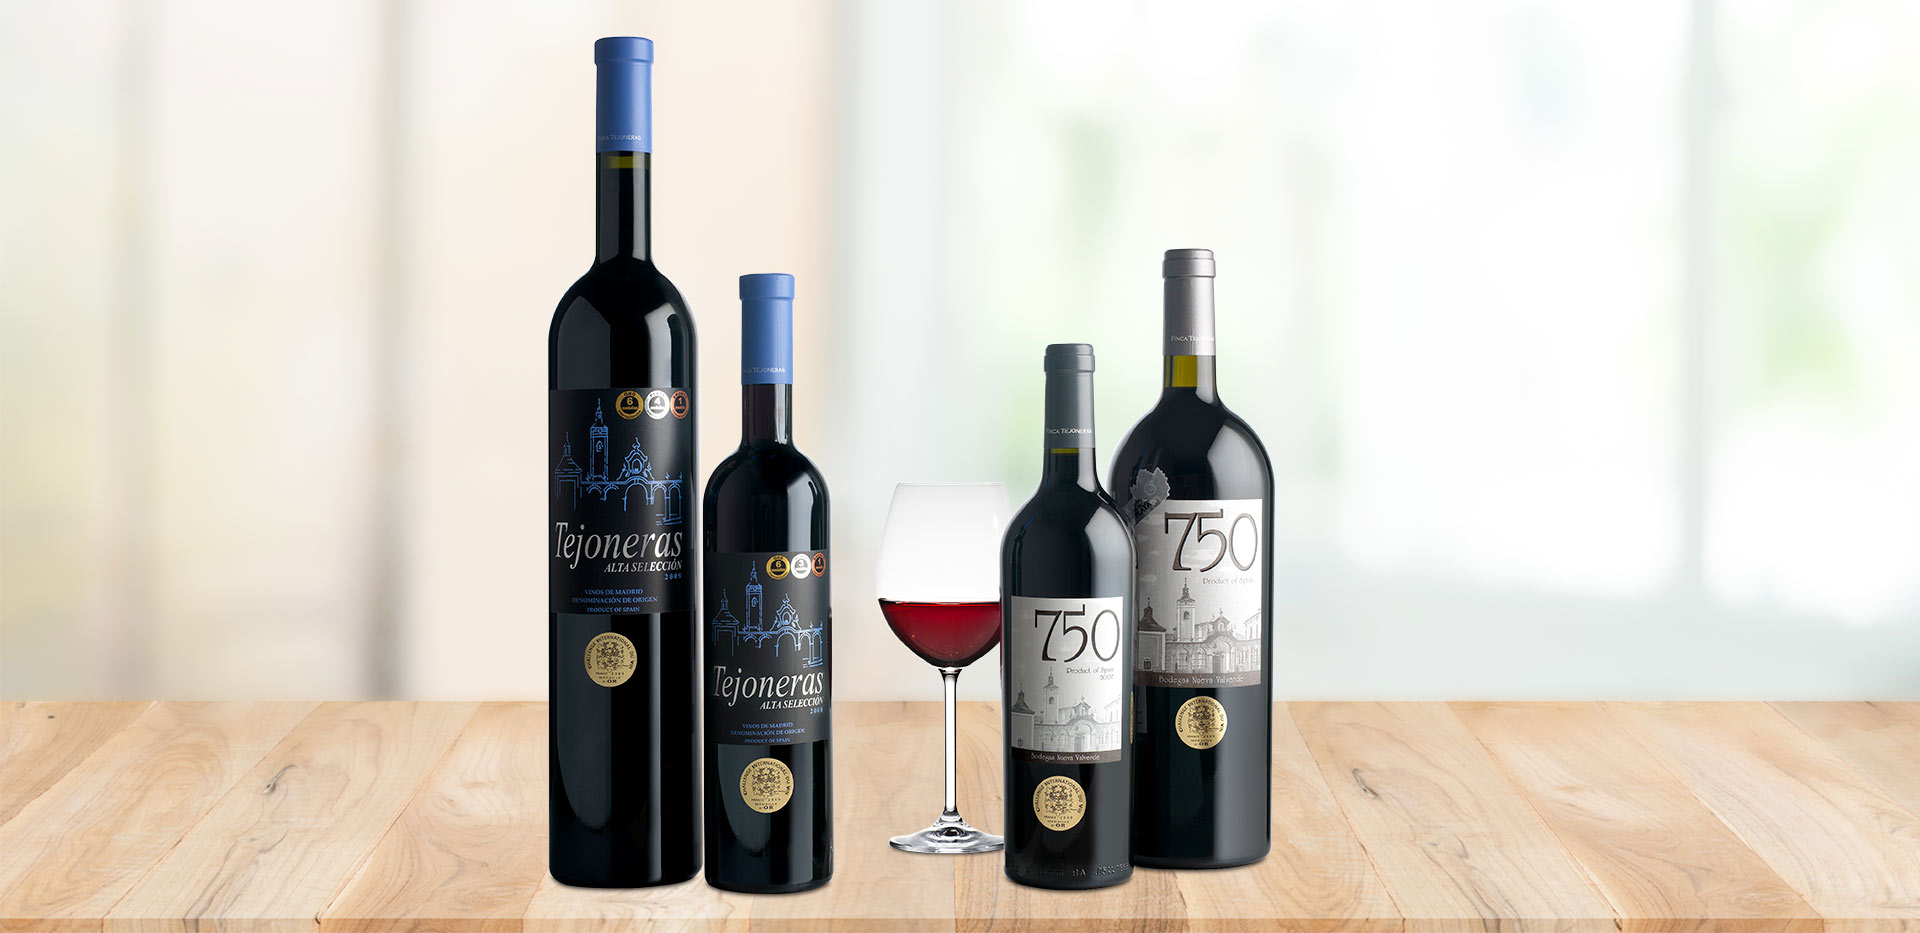 Wines from Nueva Valverde Winery